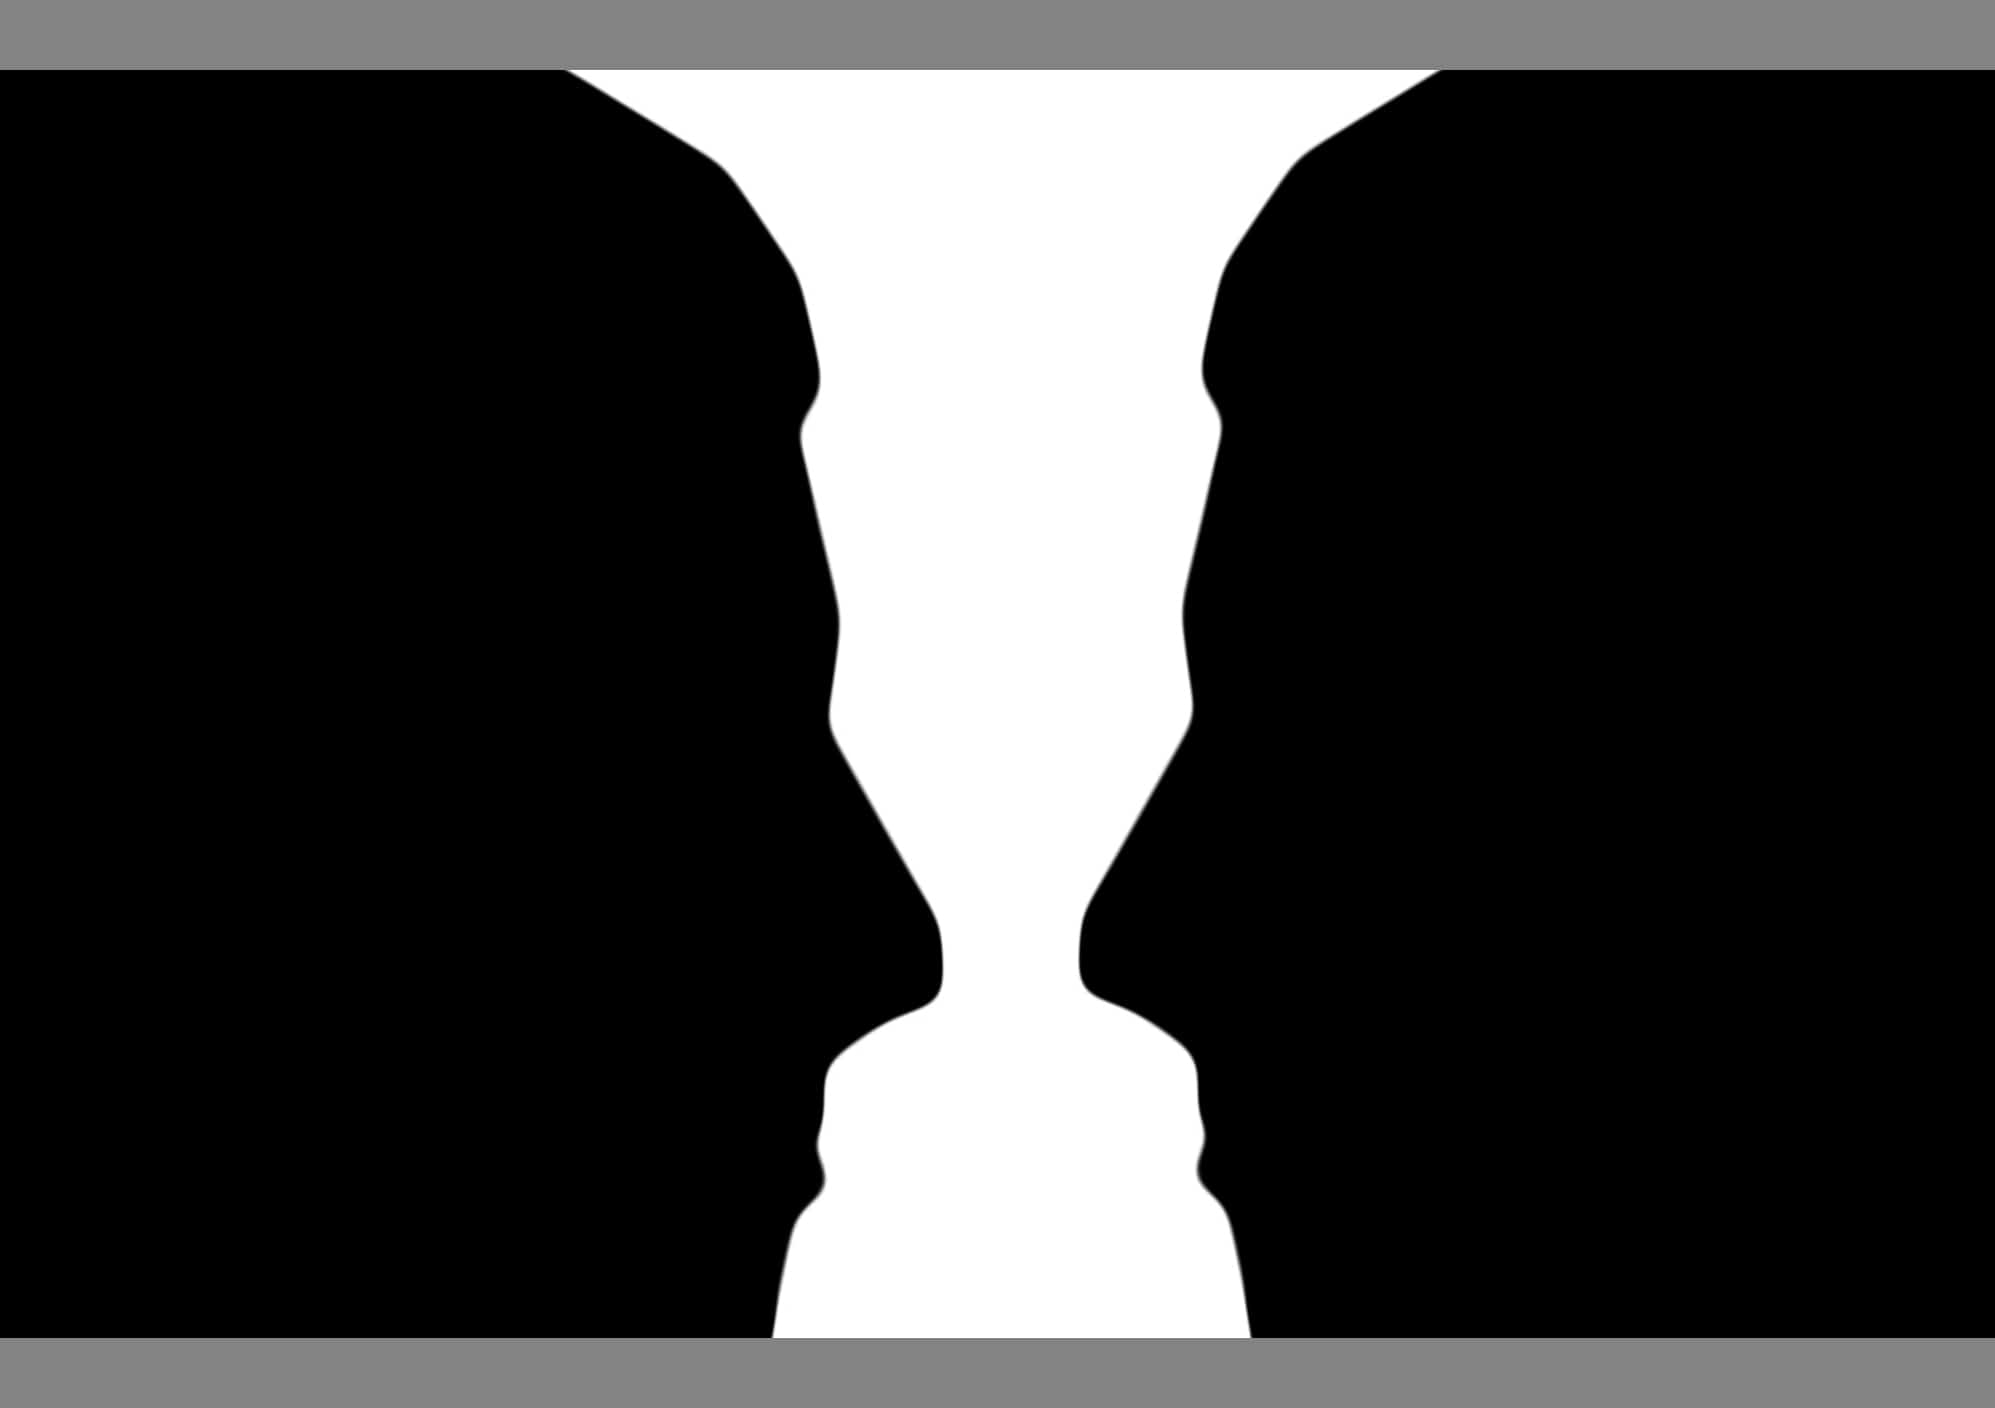 illusion of getting judged